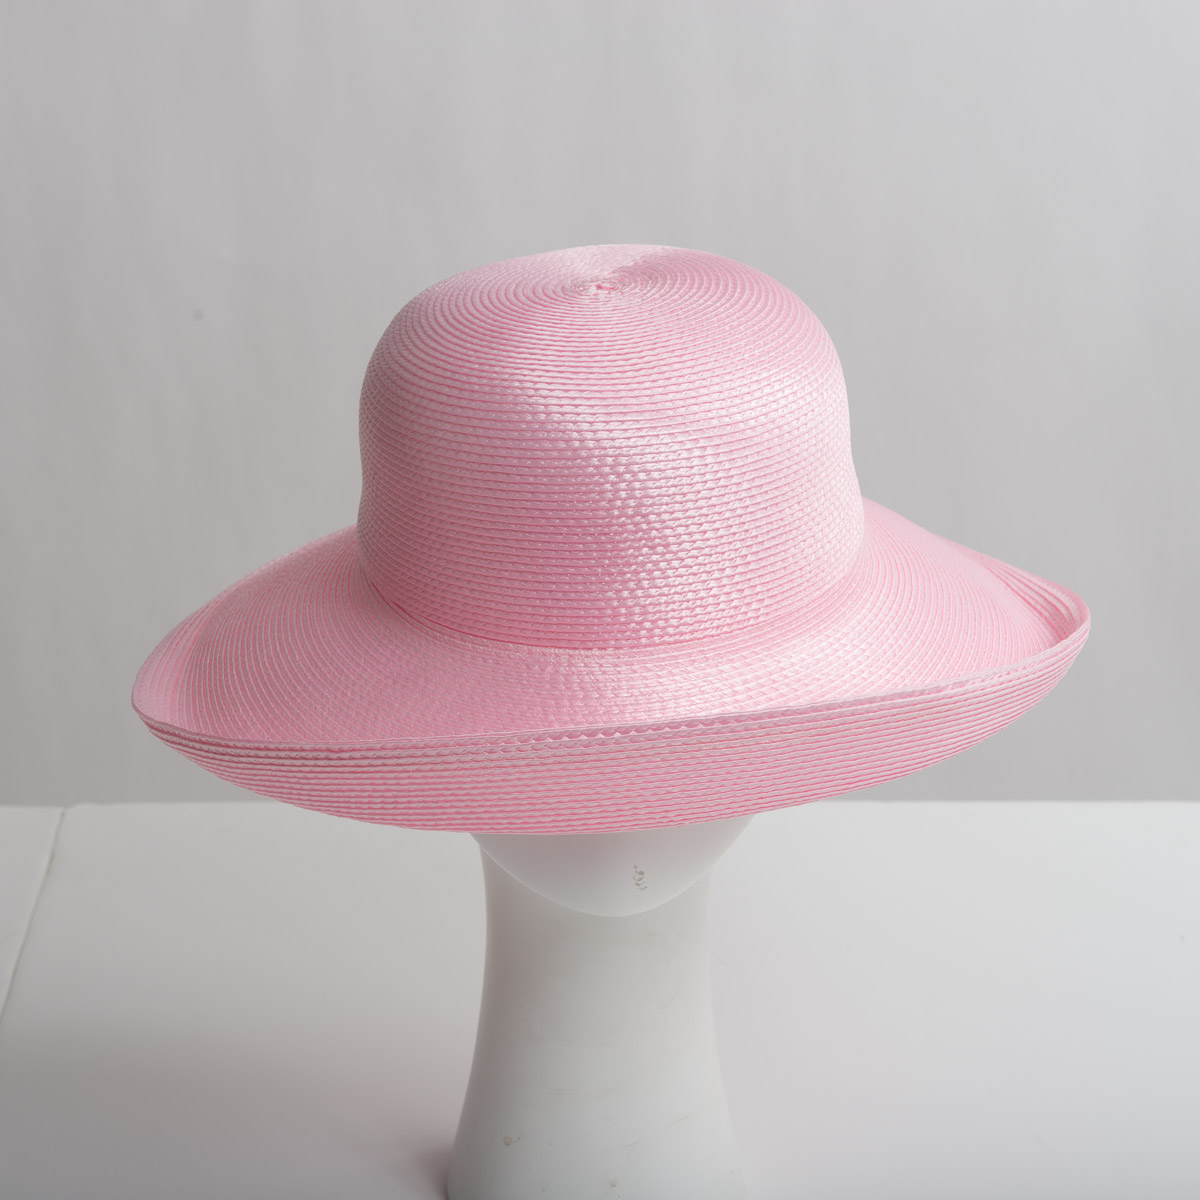 2ecd1d85446b62 Pink Polypropylene Straw Medium Brim Plain Hats-CK01R-0-14- Sun Yorkos |  Zoria